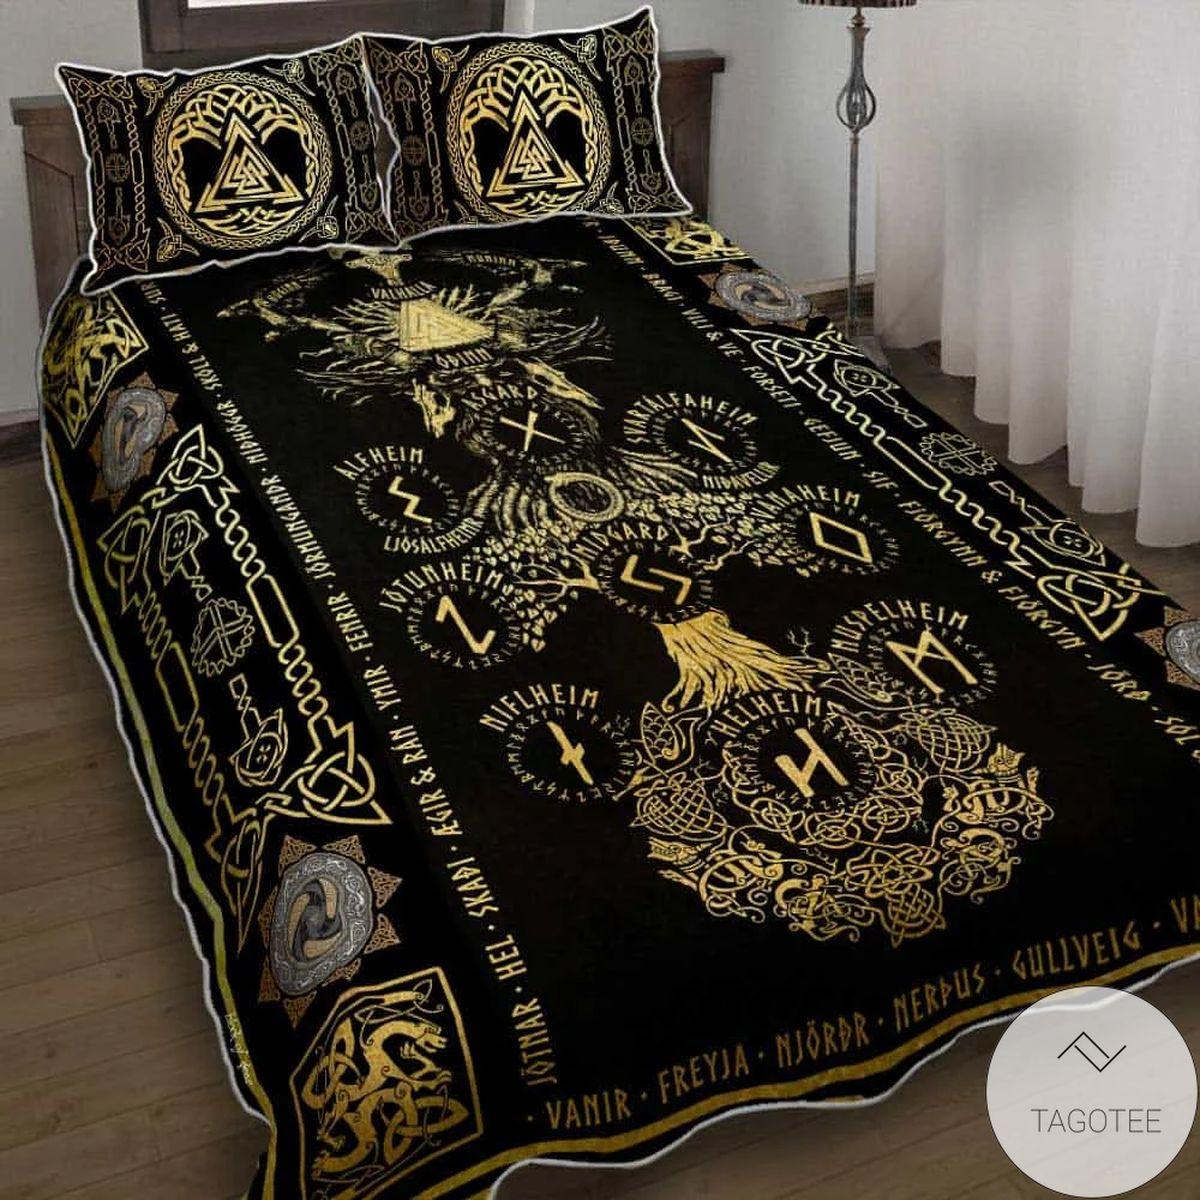 Yggdrasil Viking Odin Valhalla Tree Of Life Quilt Bedding Set